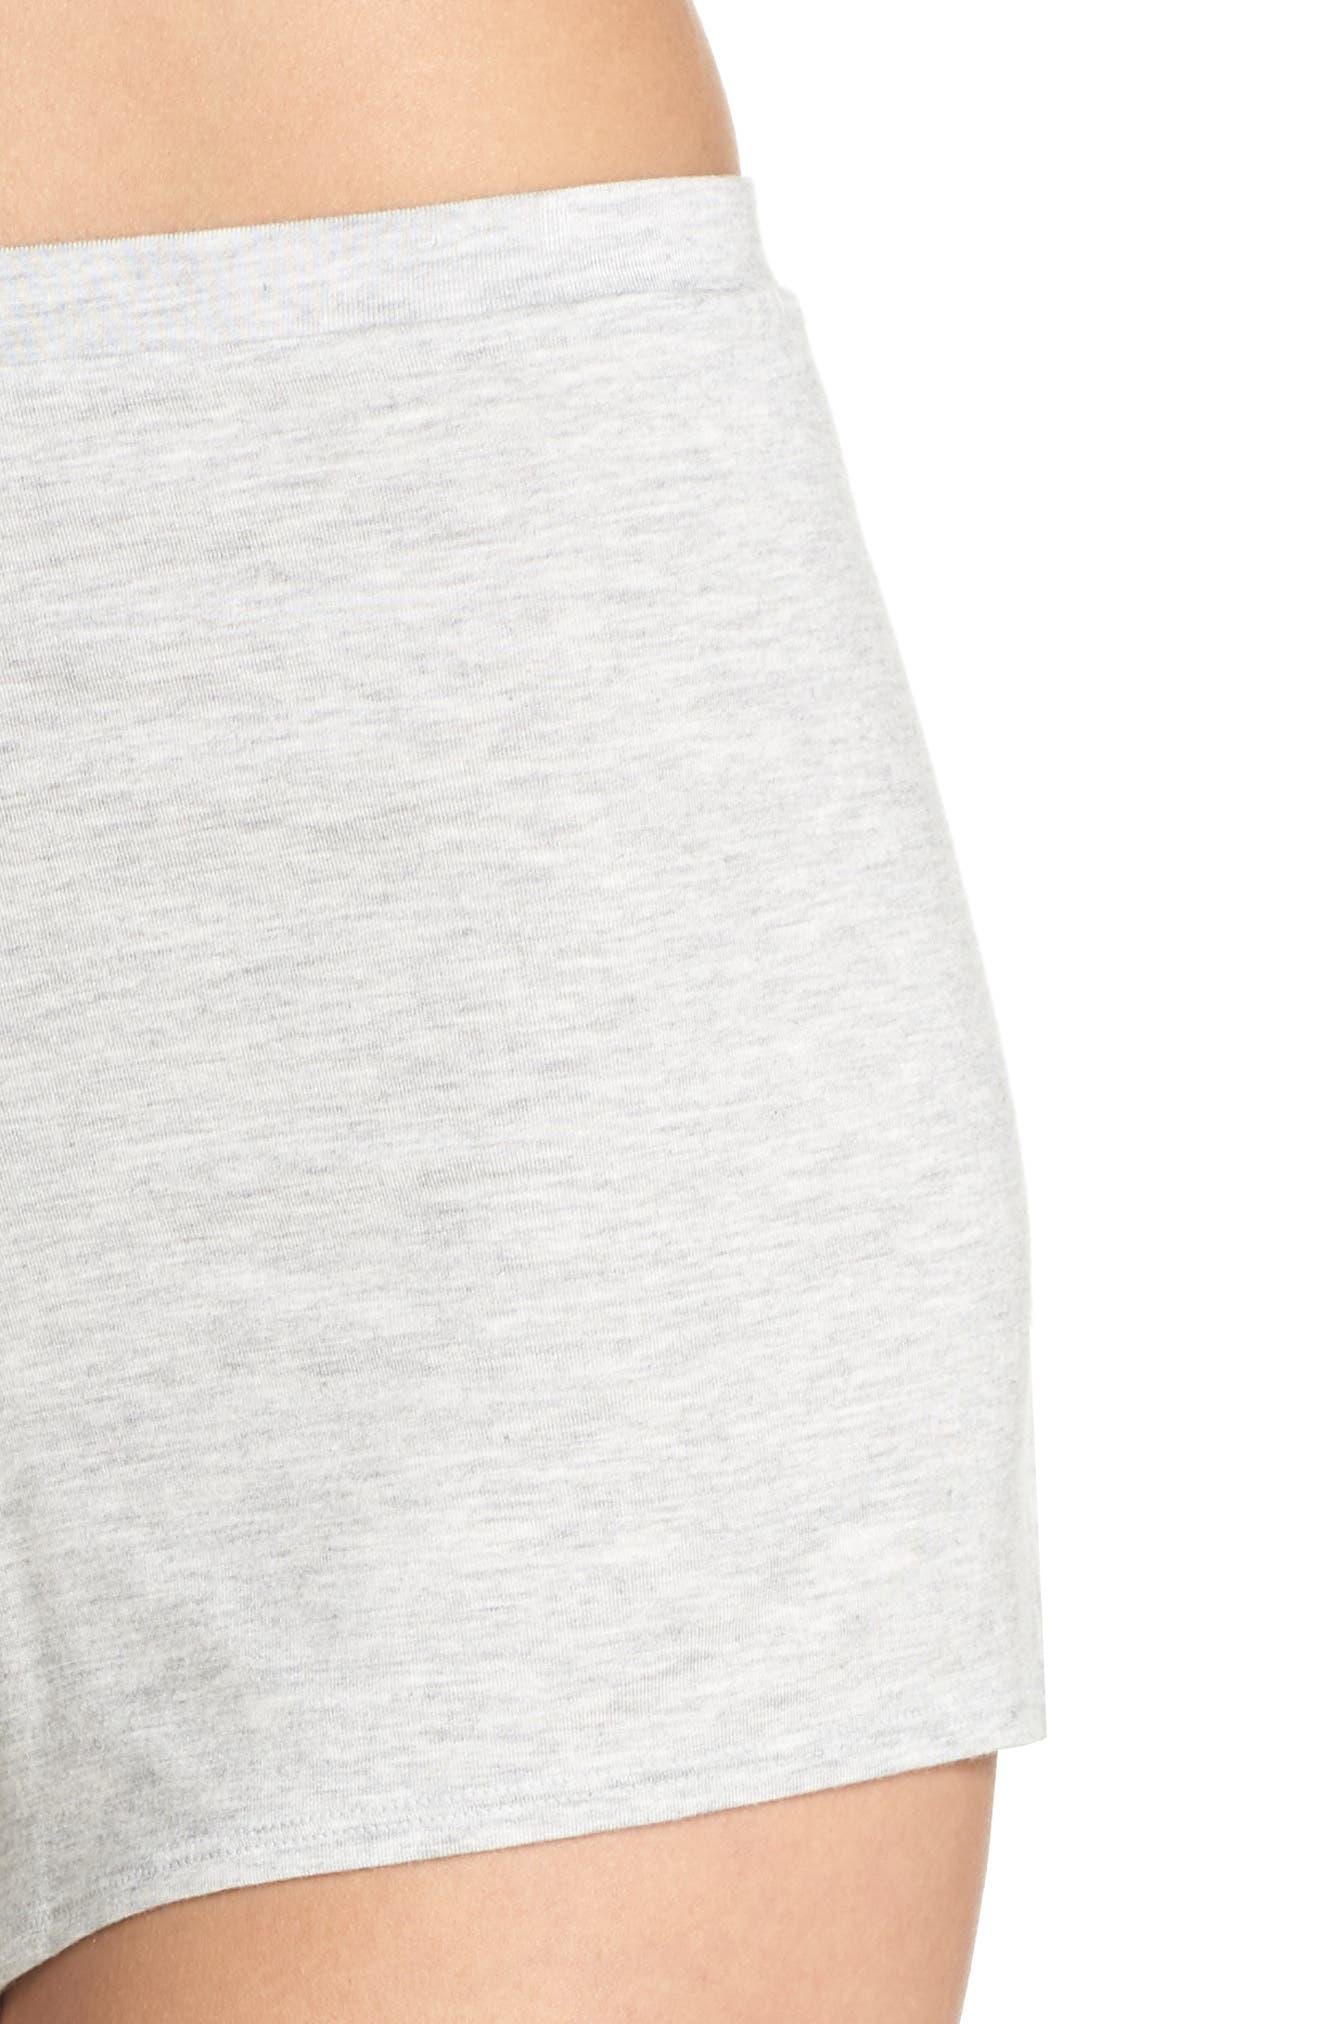 Undressed Pajama Shorts,                             Alternate thumbnail 8, color,